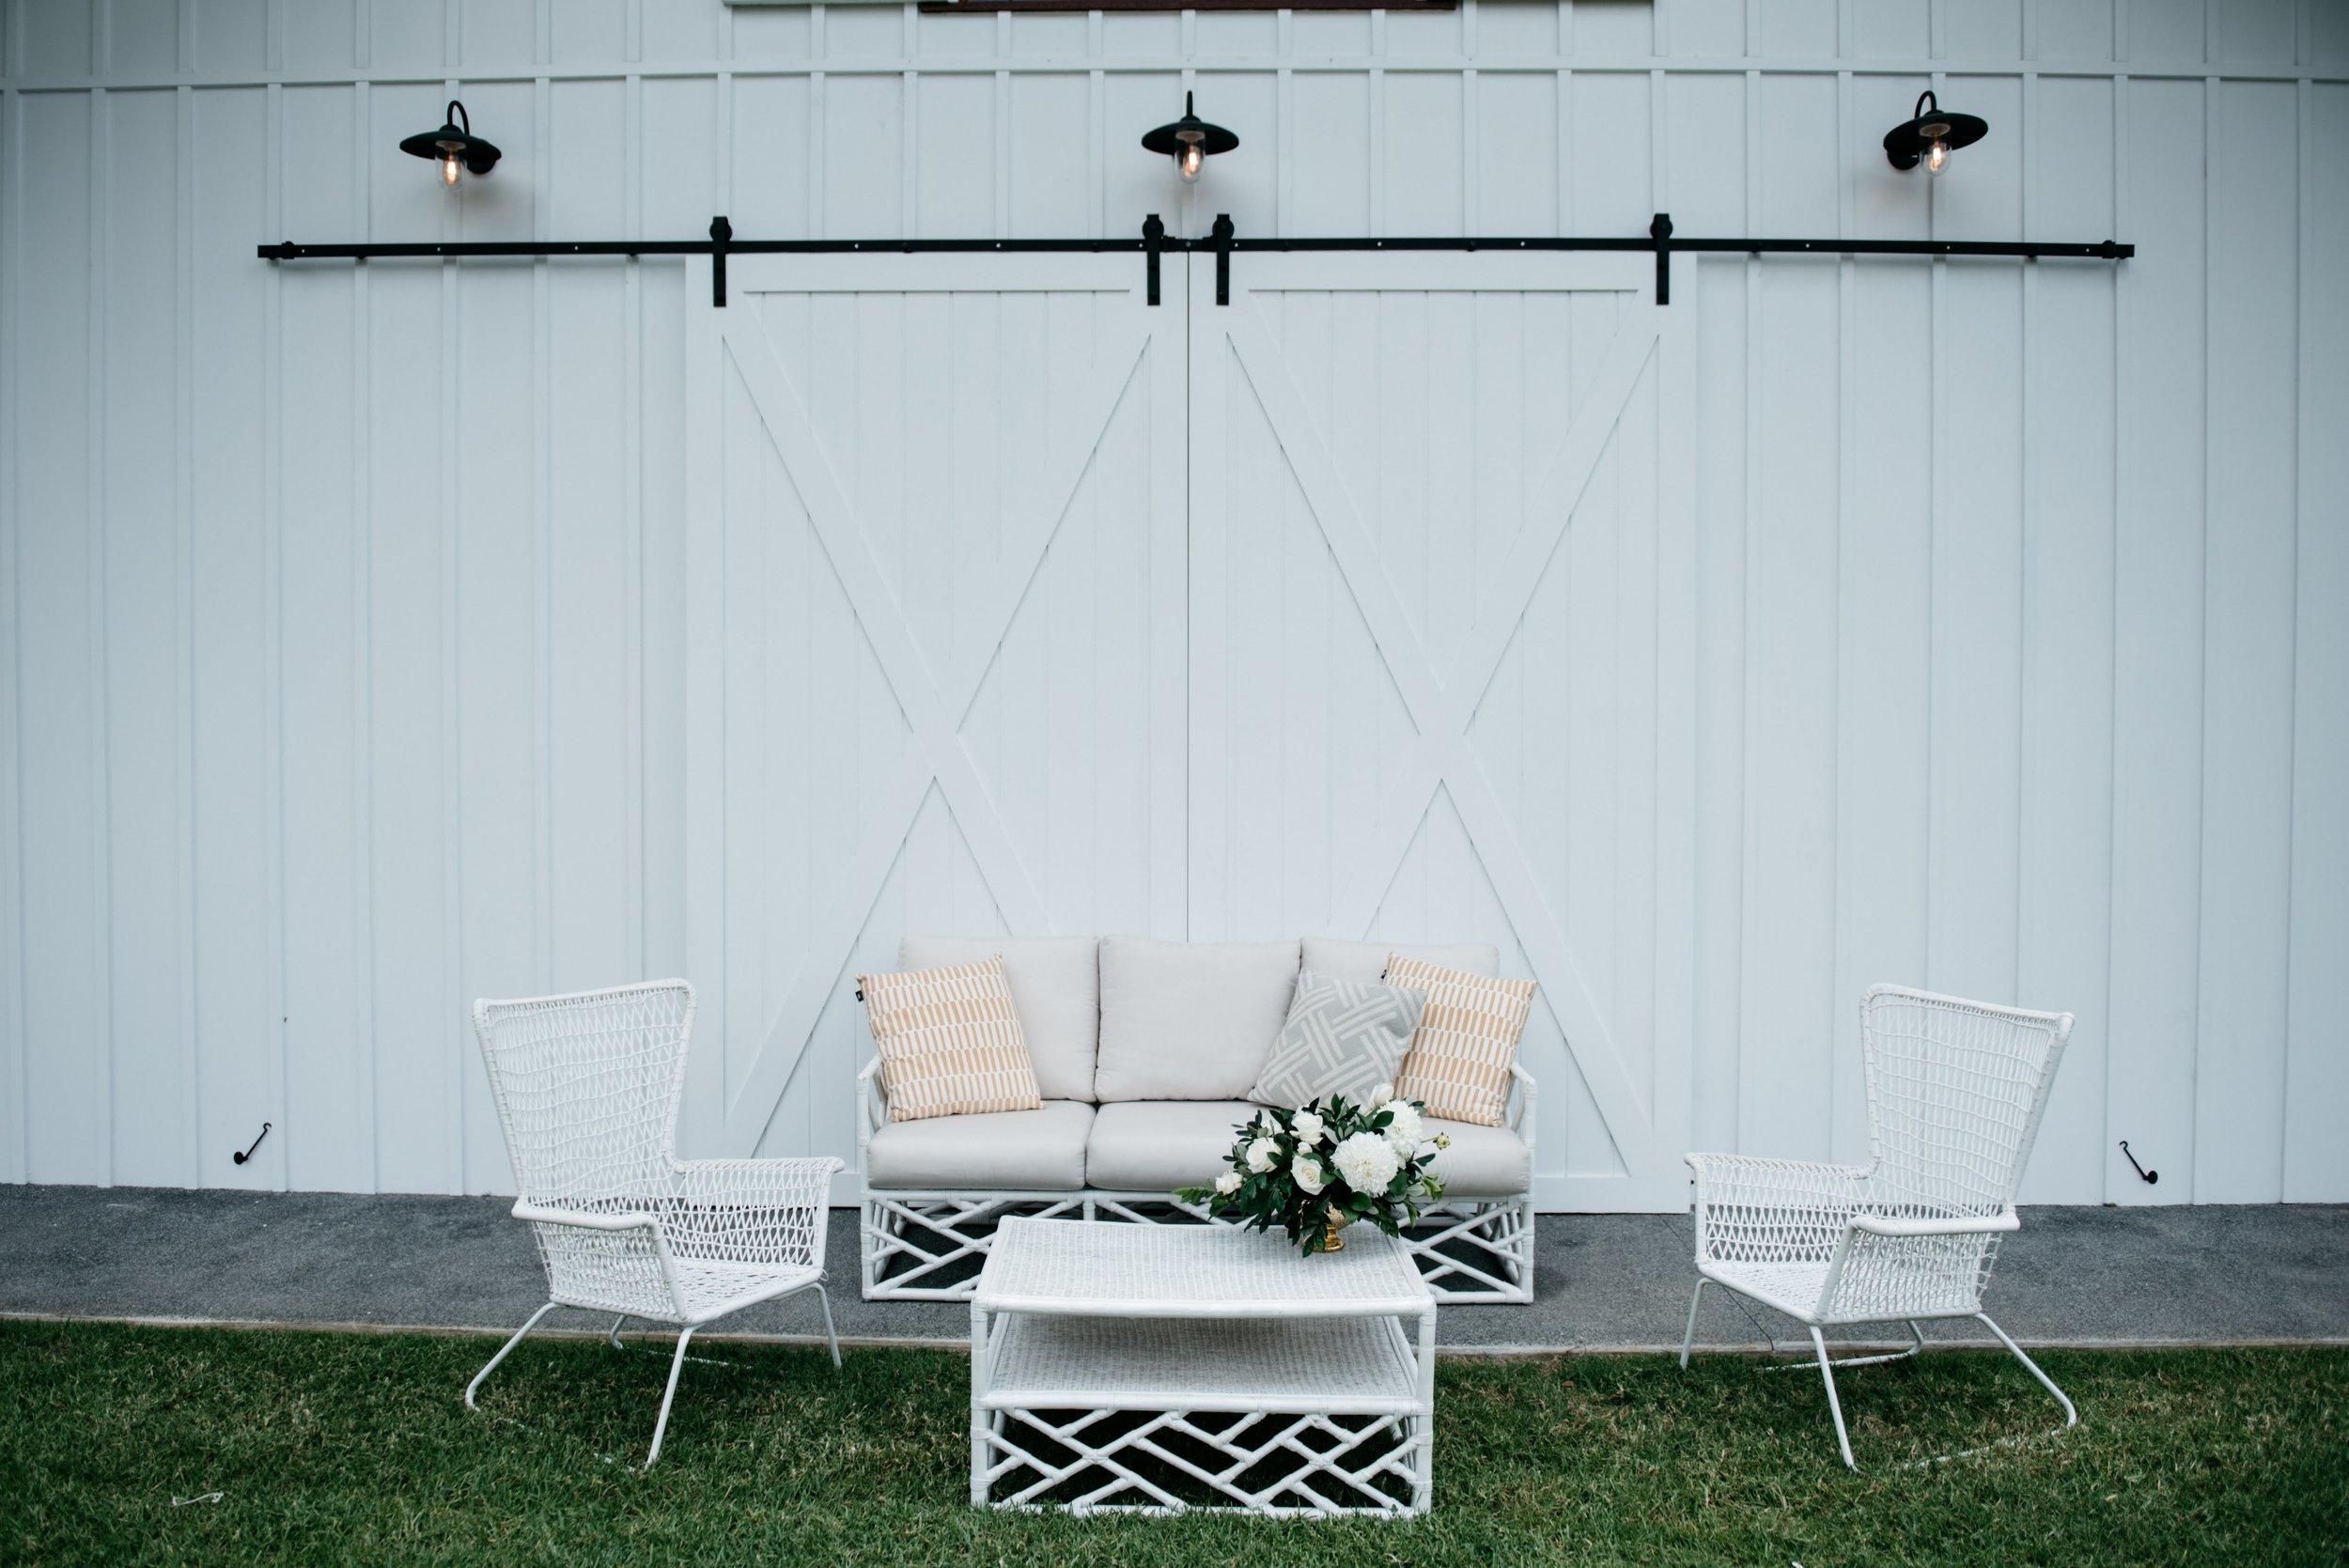 Real Wedding at Summergrove Estate Barn, Hampton Event Hire Blog, Lounge Furniture